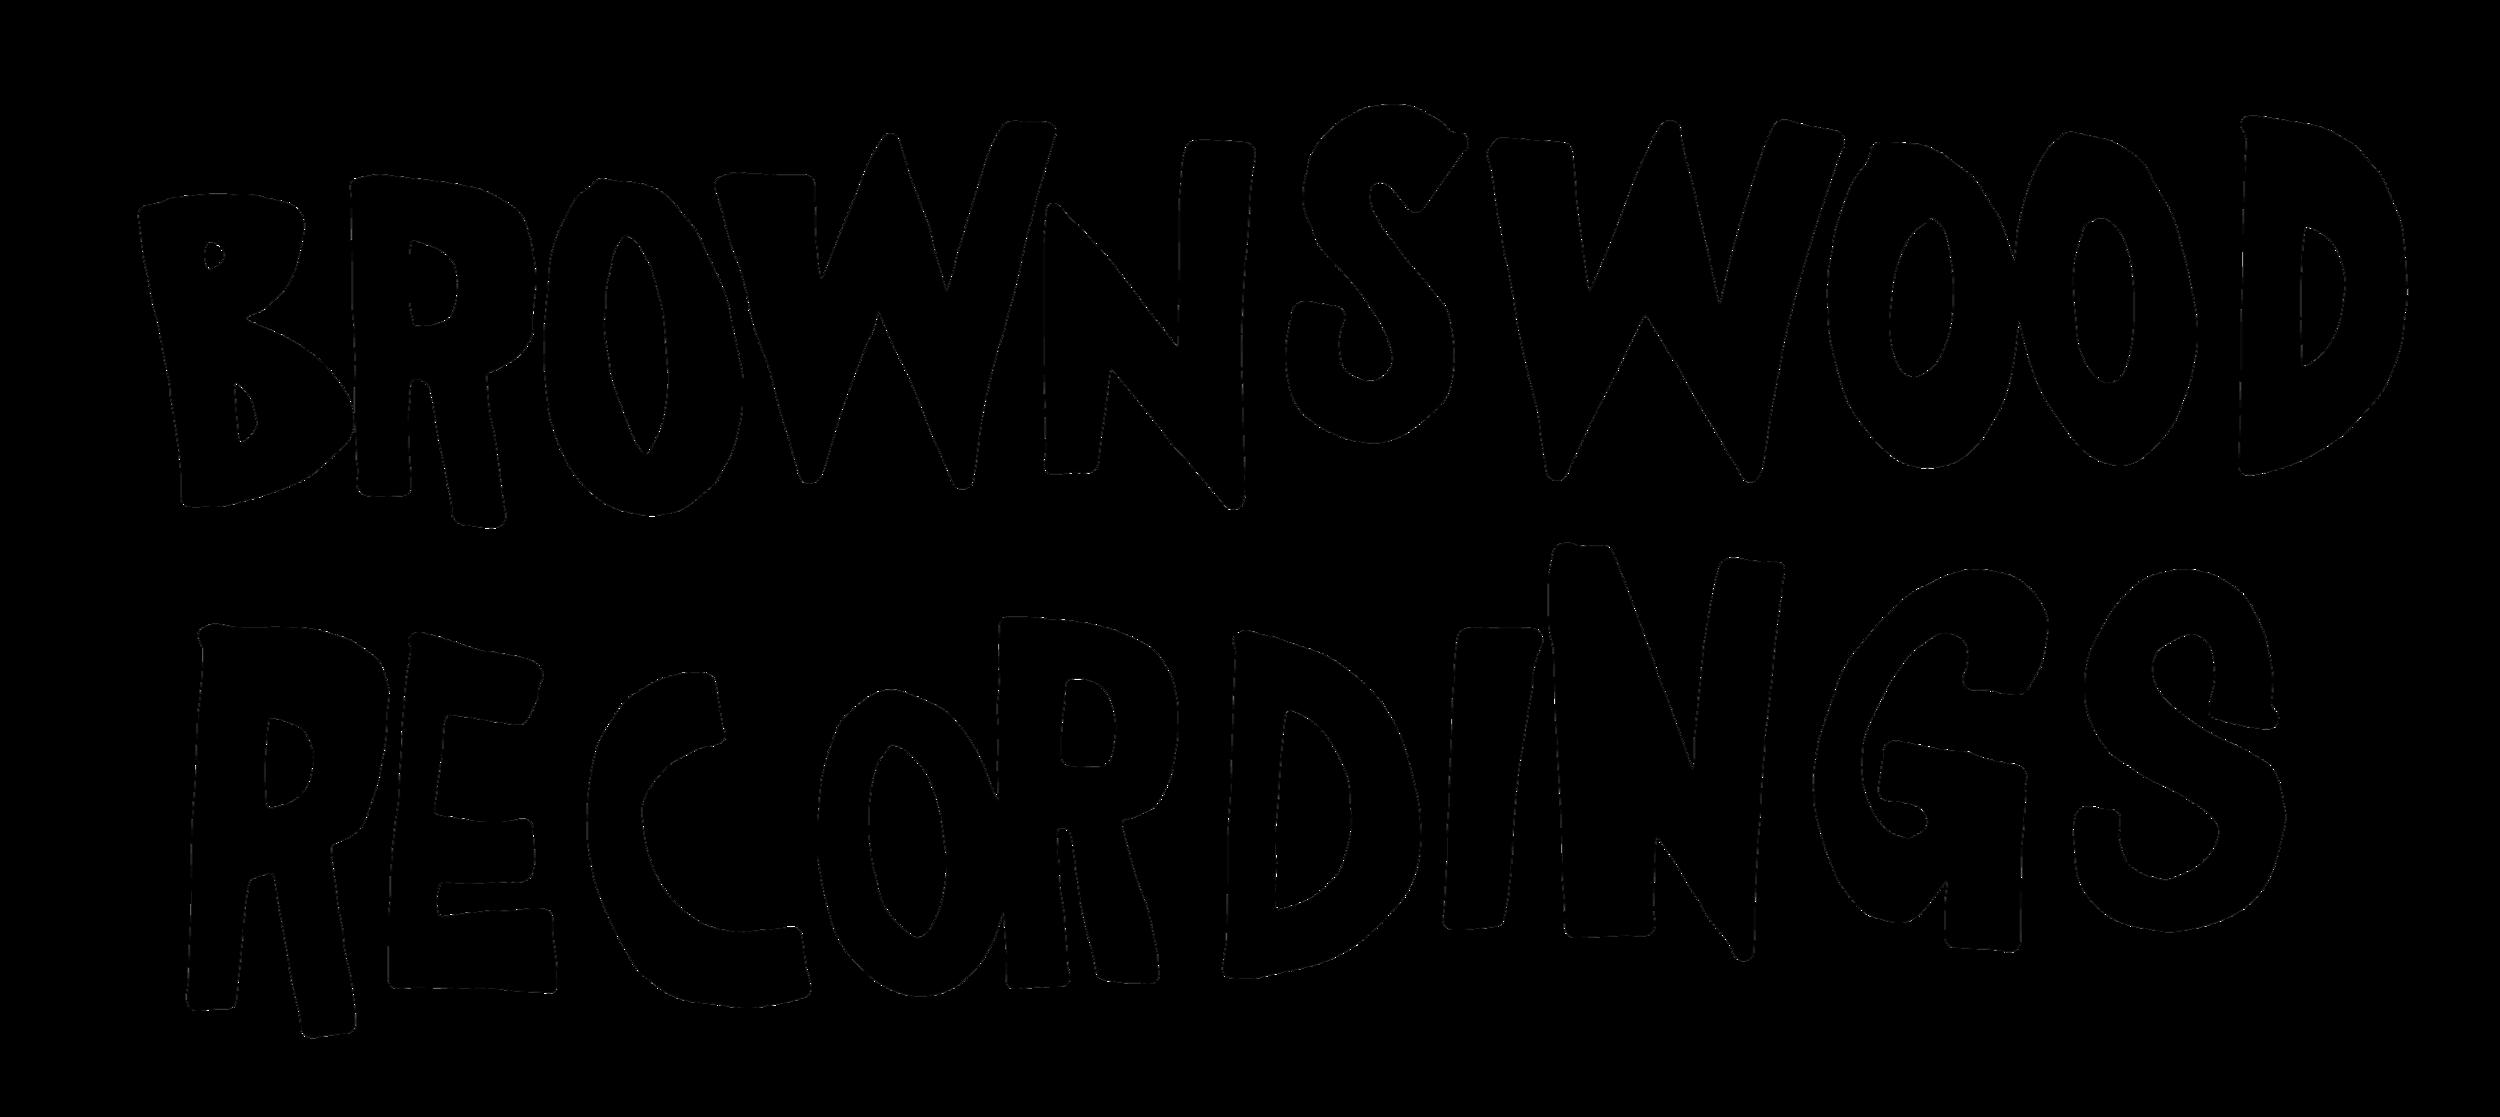 Brownswood logo Black solidCUT.png